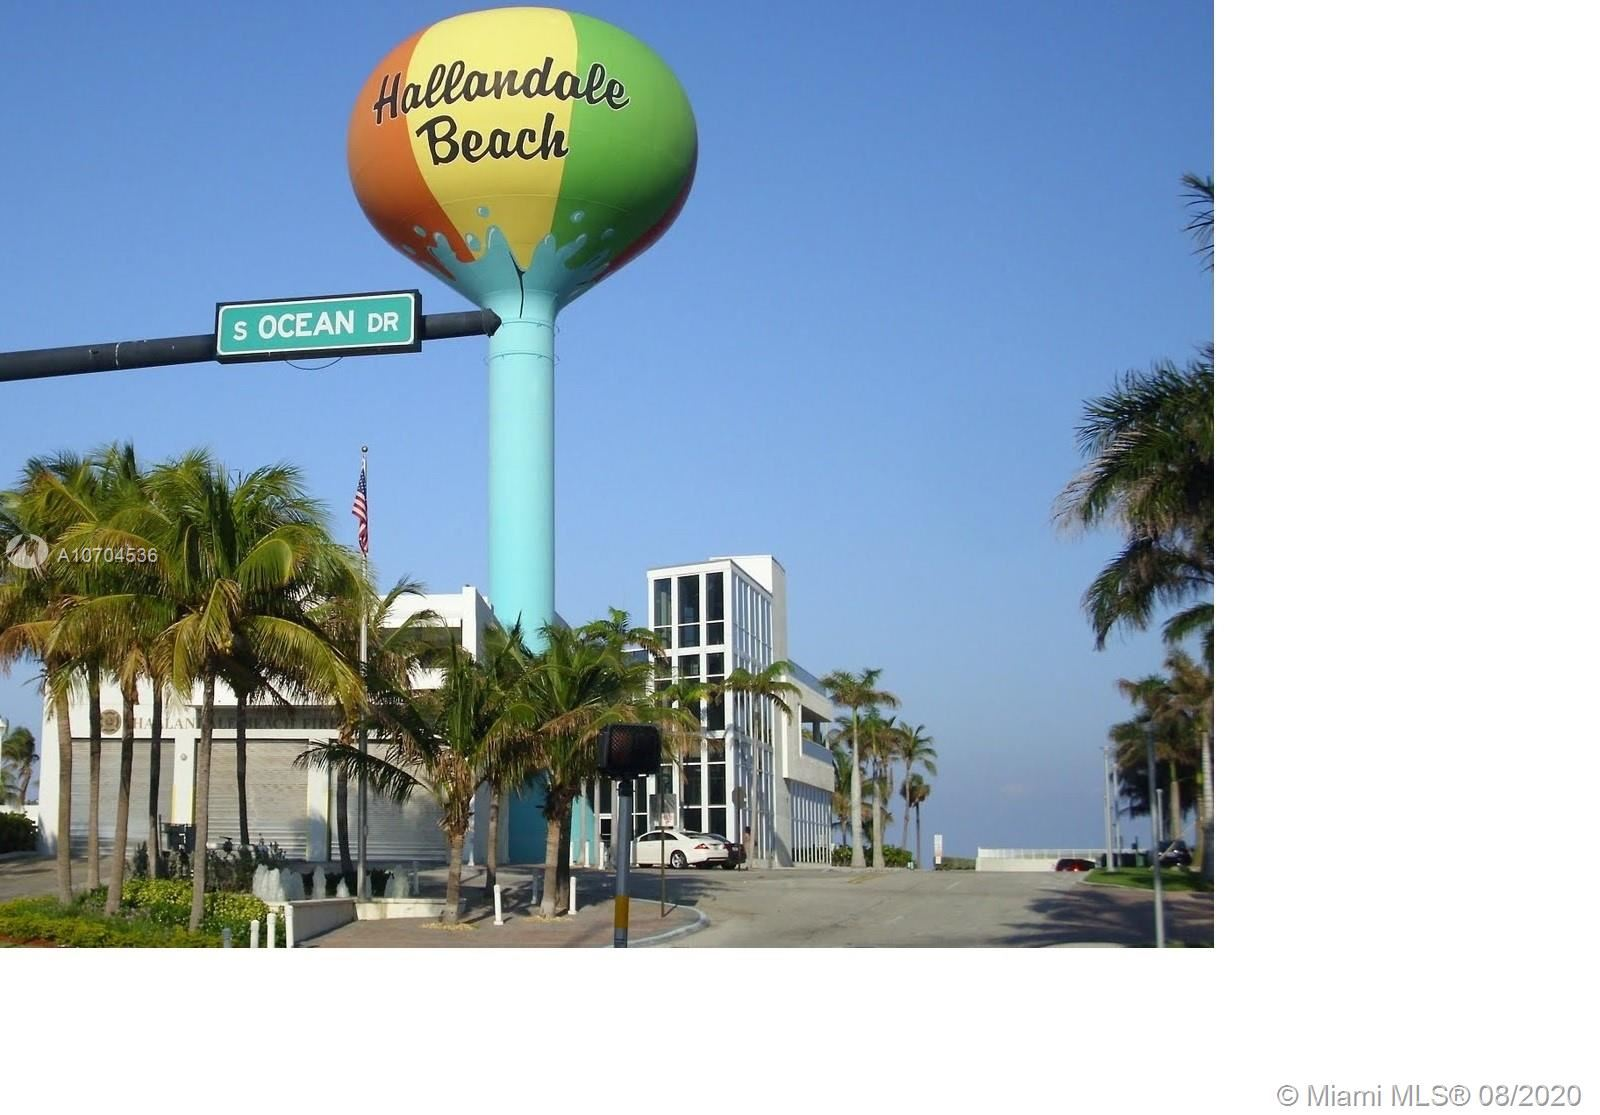 300 NE 14th Ave #307, Hallandale Beach, FL 33009 - #: A10704536